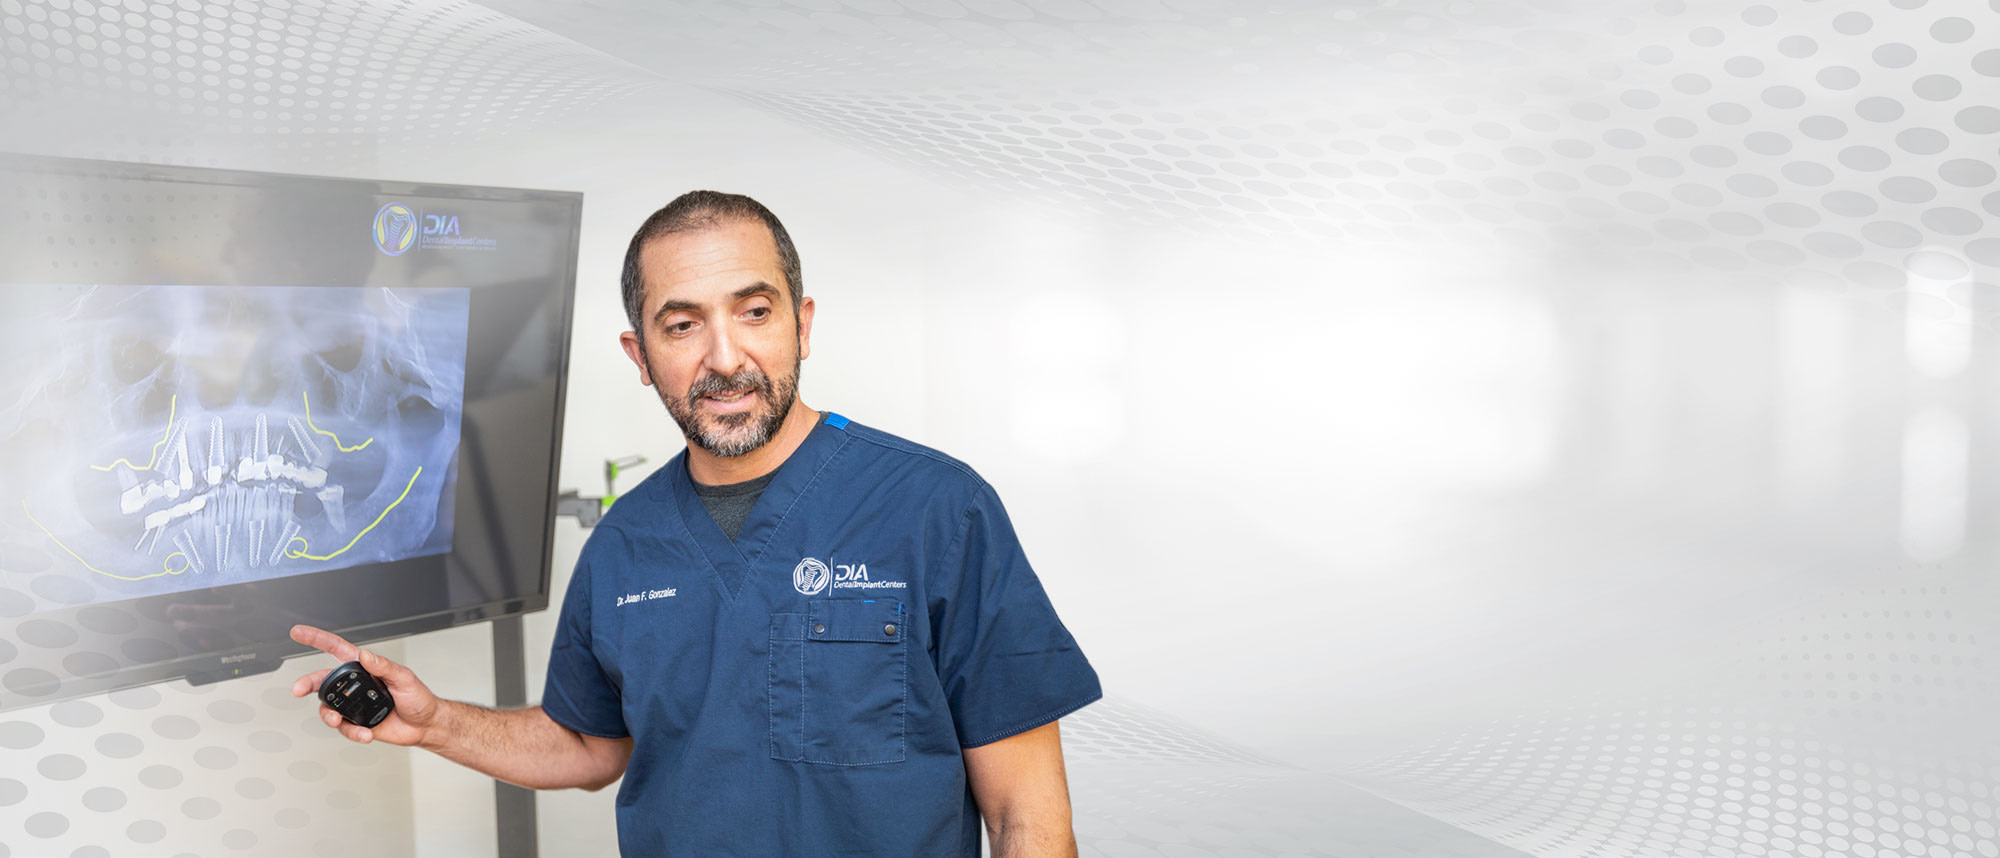 Experienced Dr Gonzalez talking about dental proceedure - Dental Implant Center